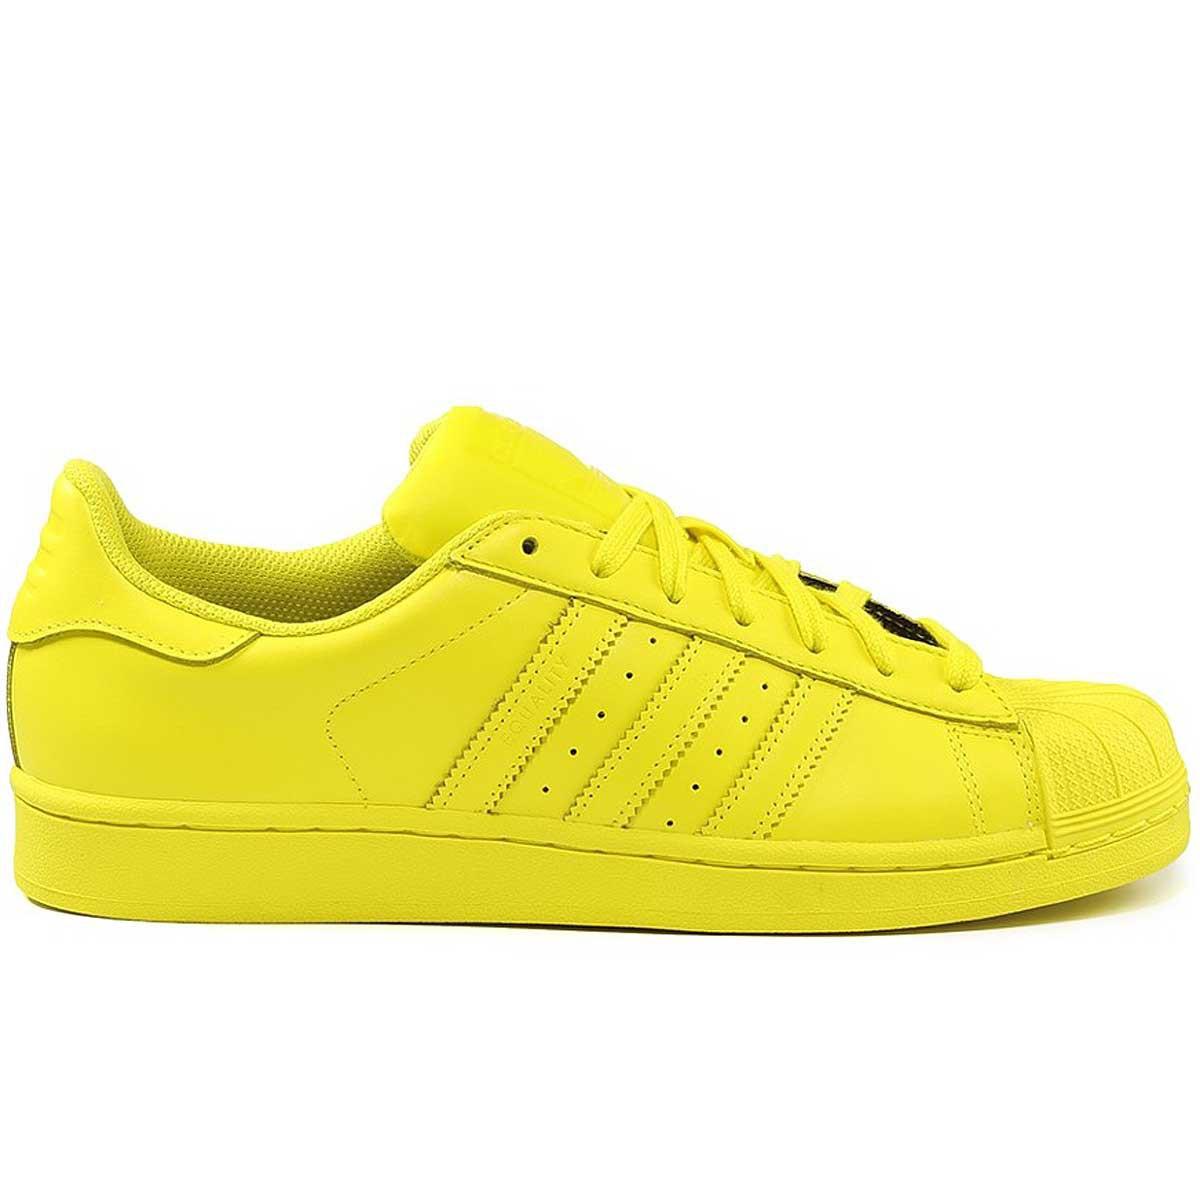 adidas superstar jaune pas cher